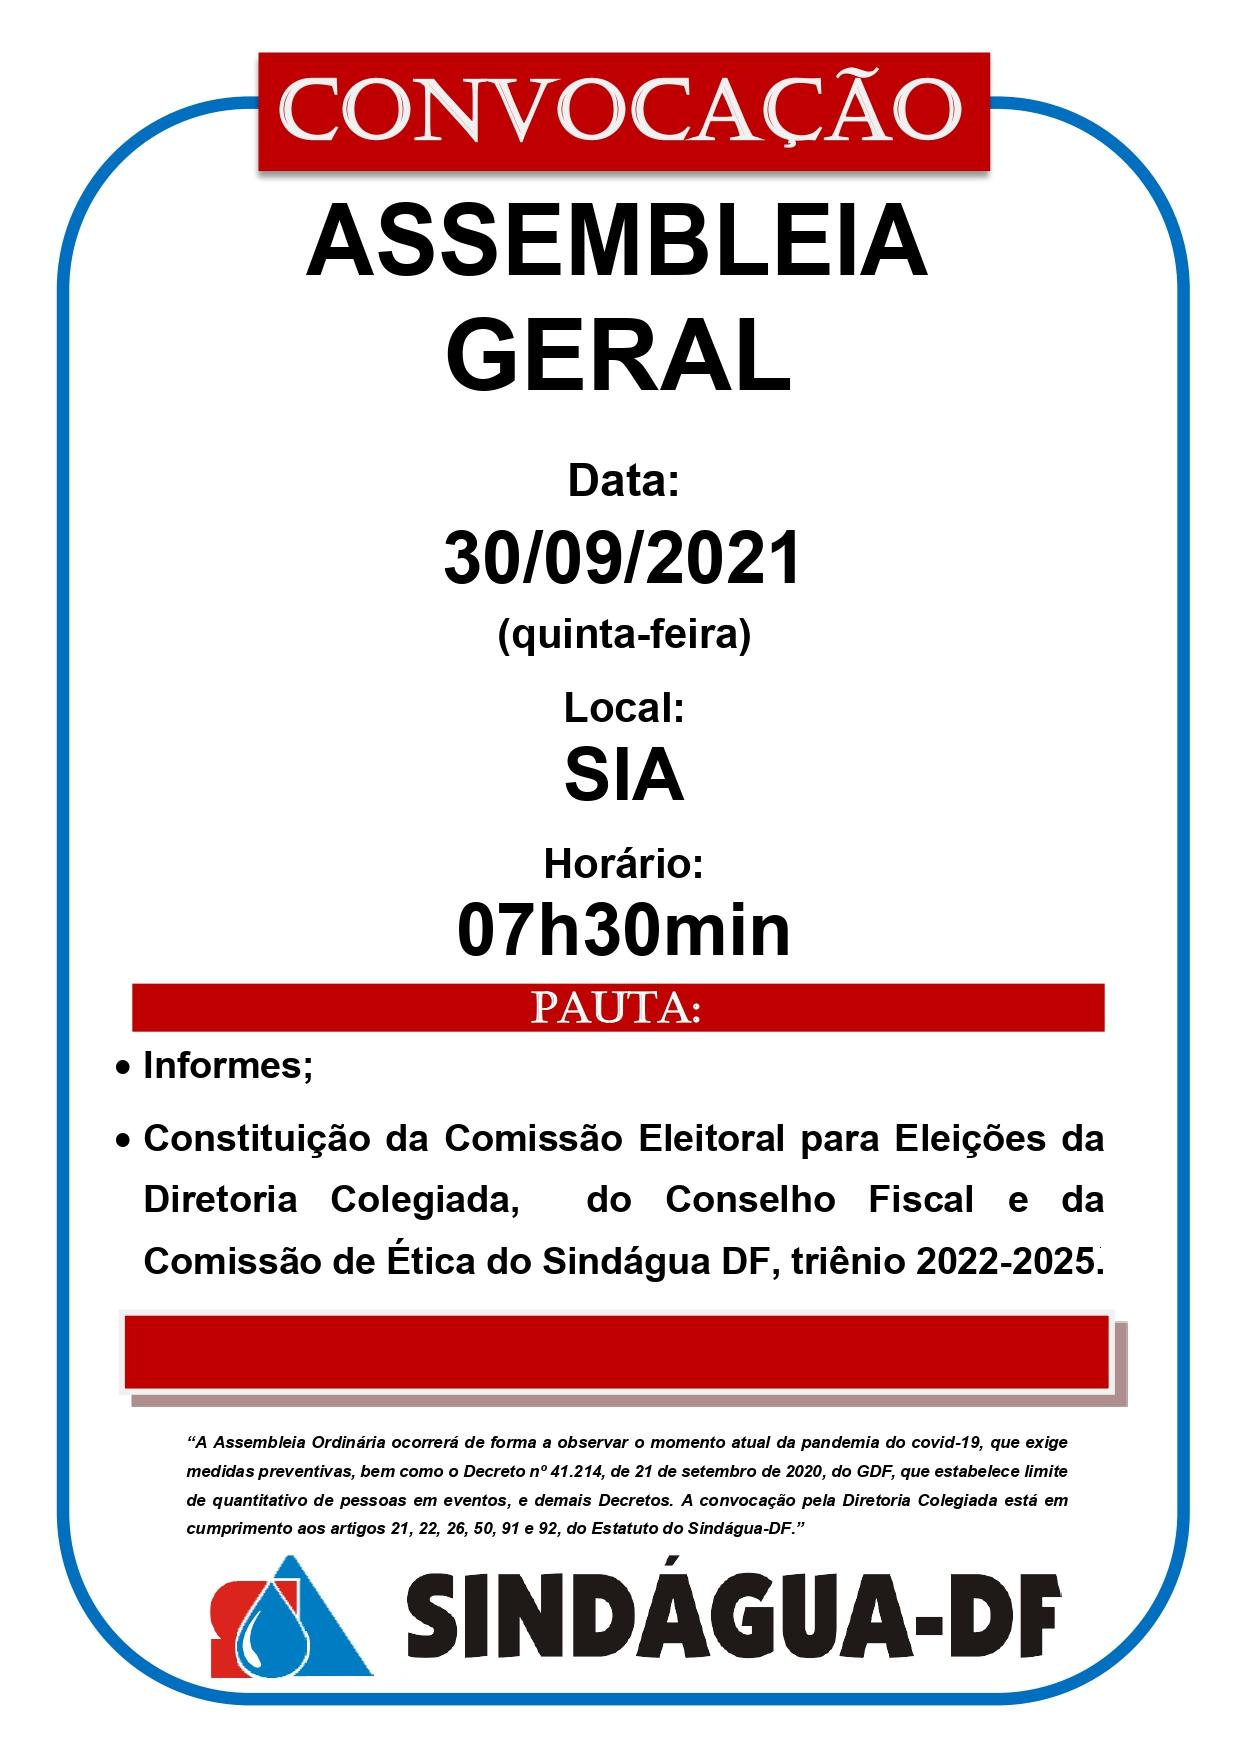 ASSEMBLEIA GERAL 30/09